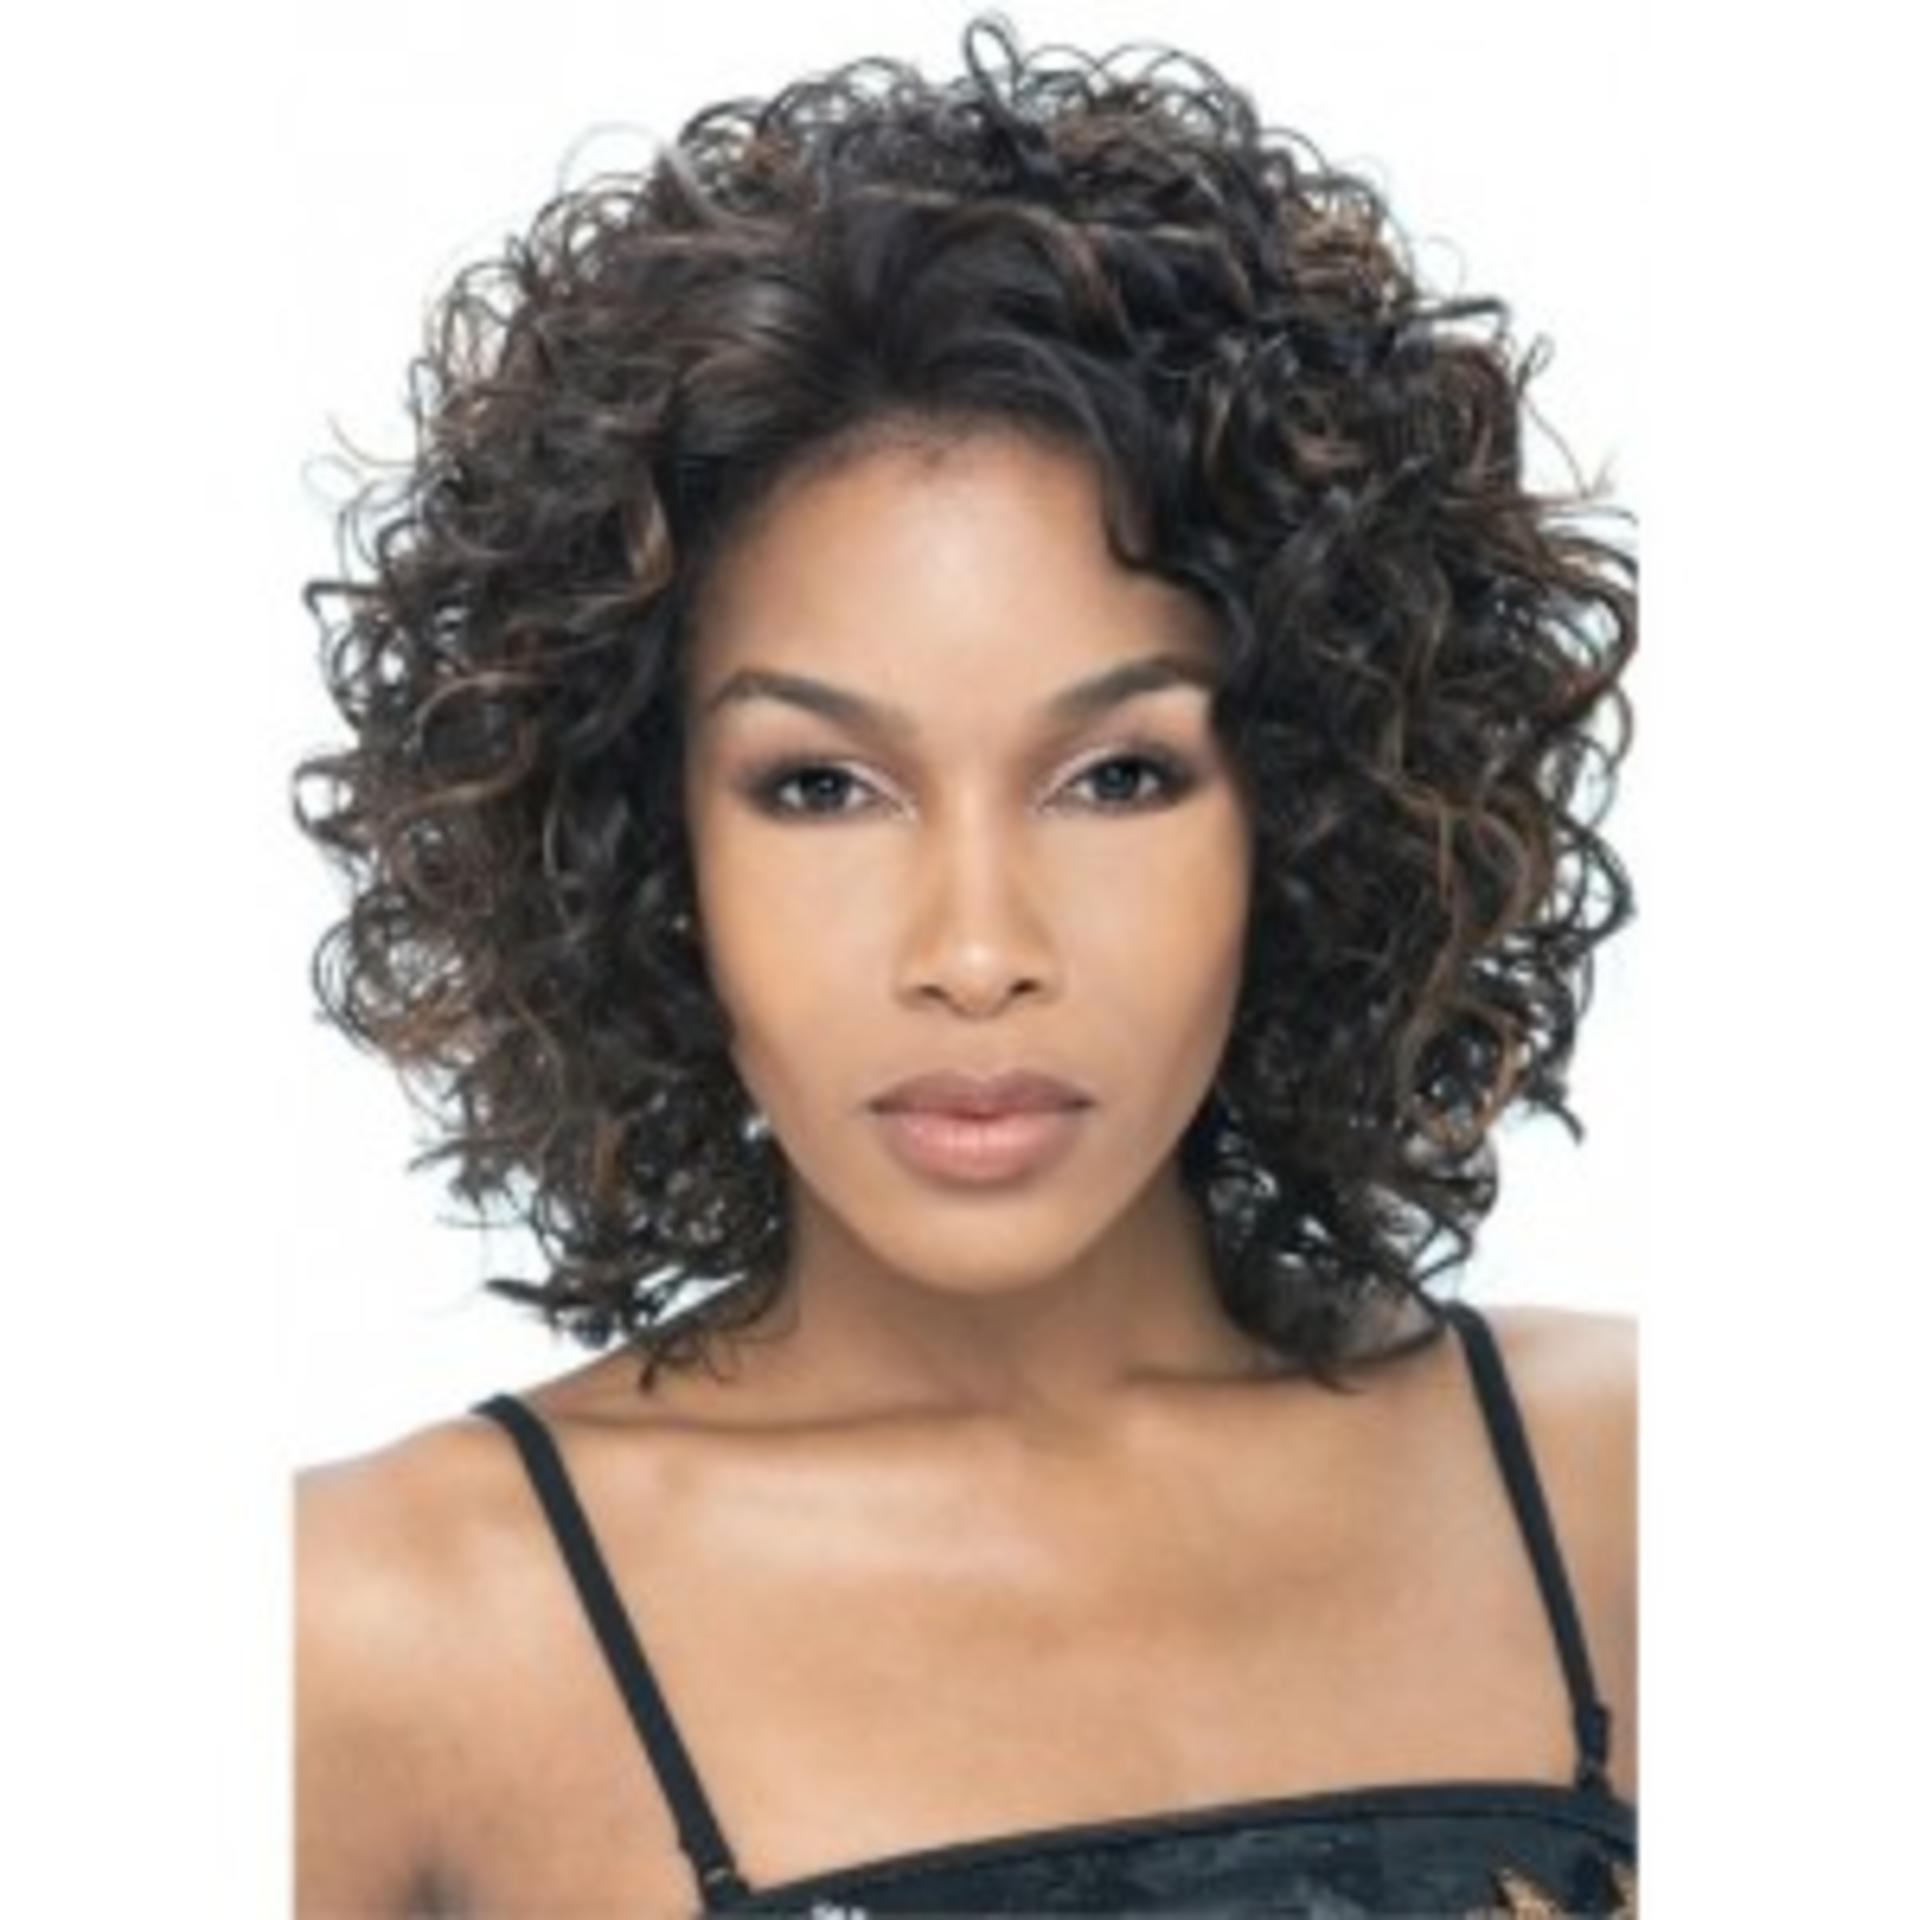 itsmonishamehta - model-model-natural-hair-synthetic-lace-front-wig-jenna-e58